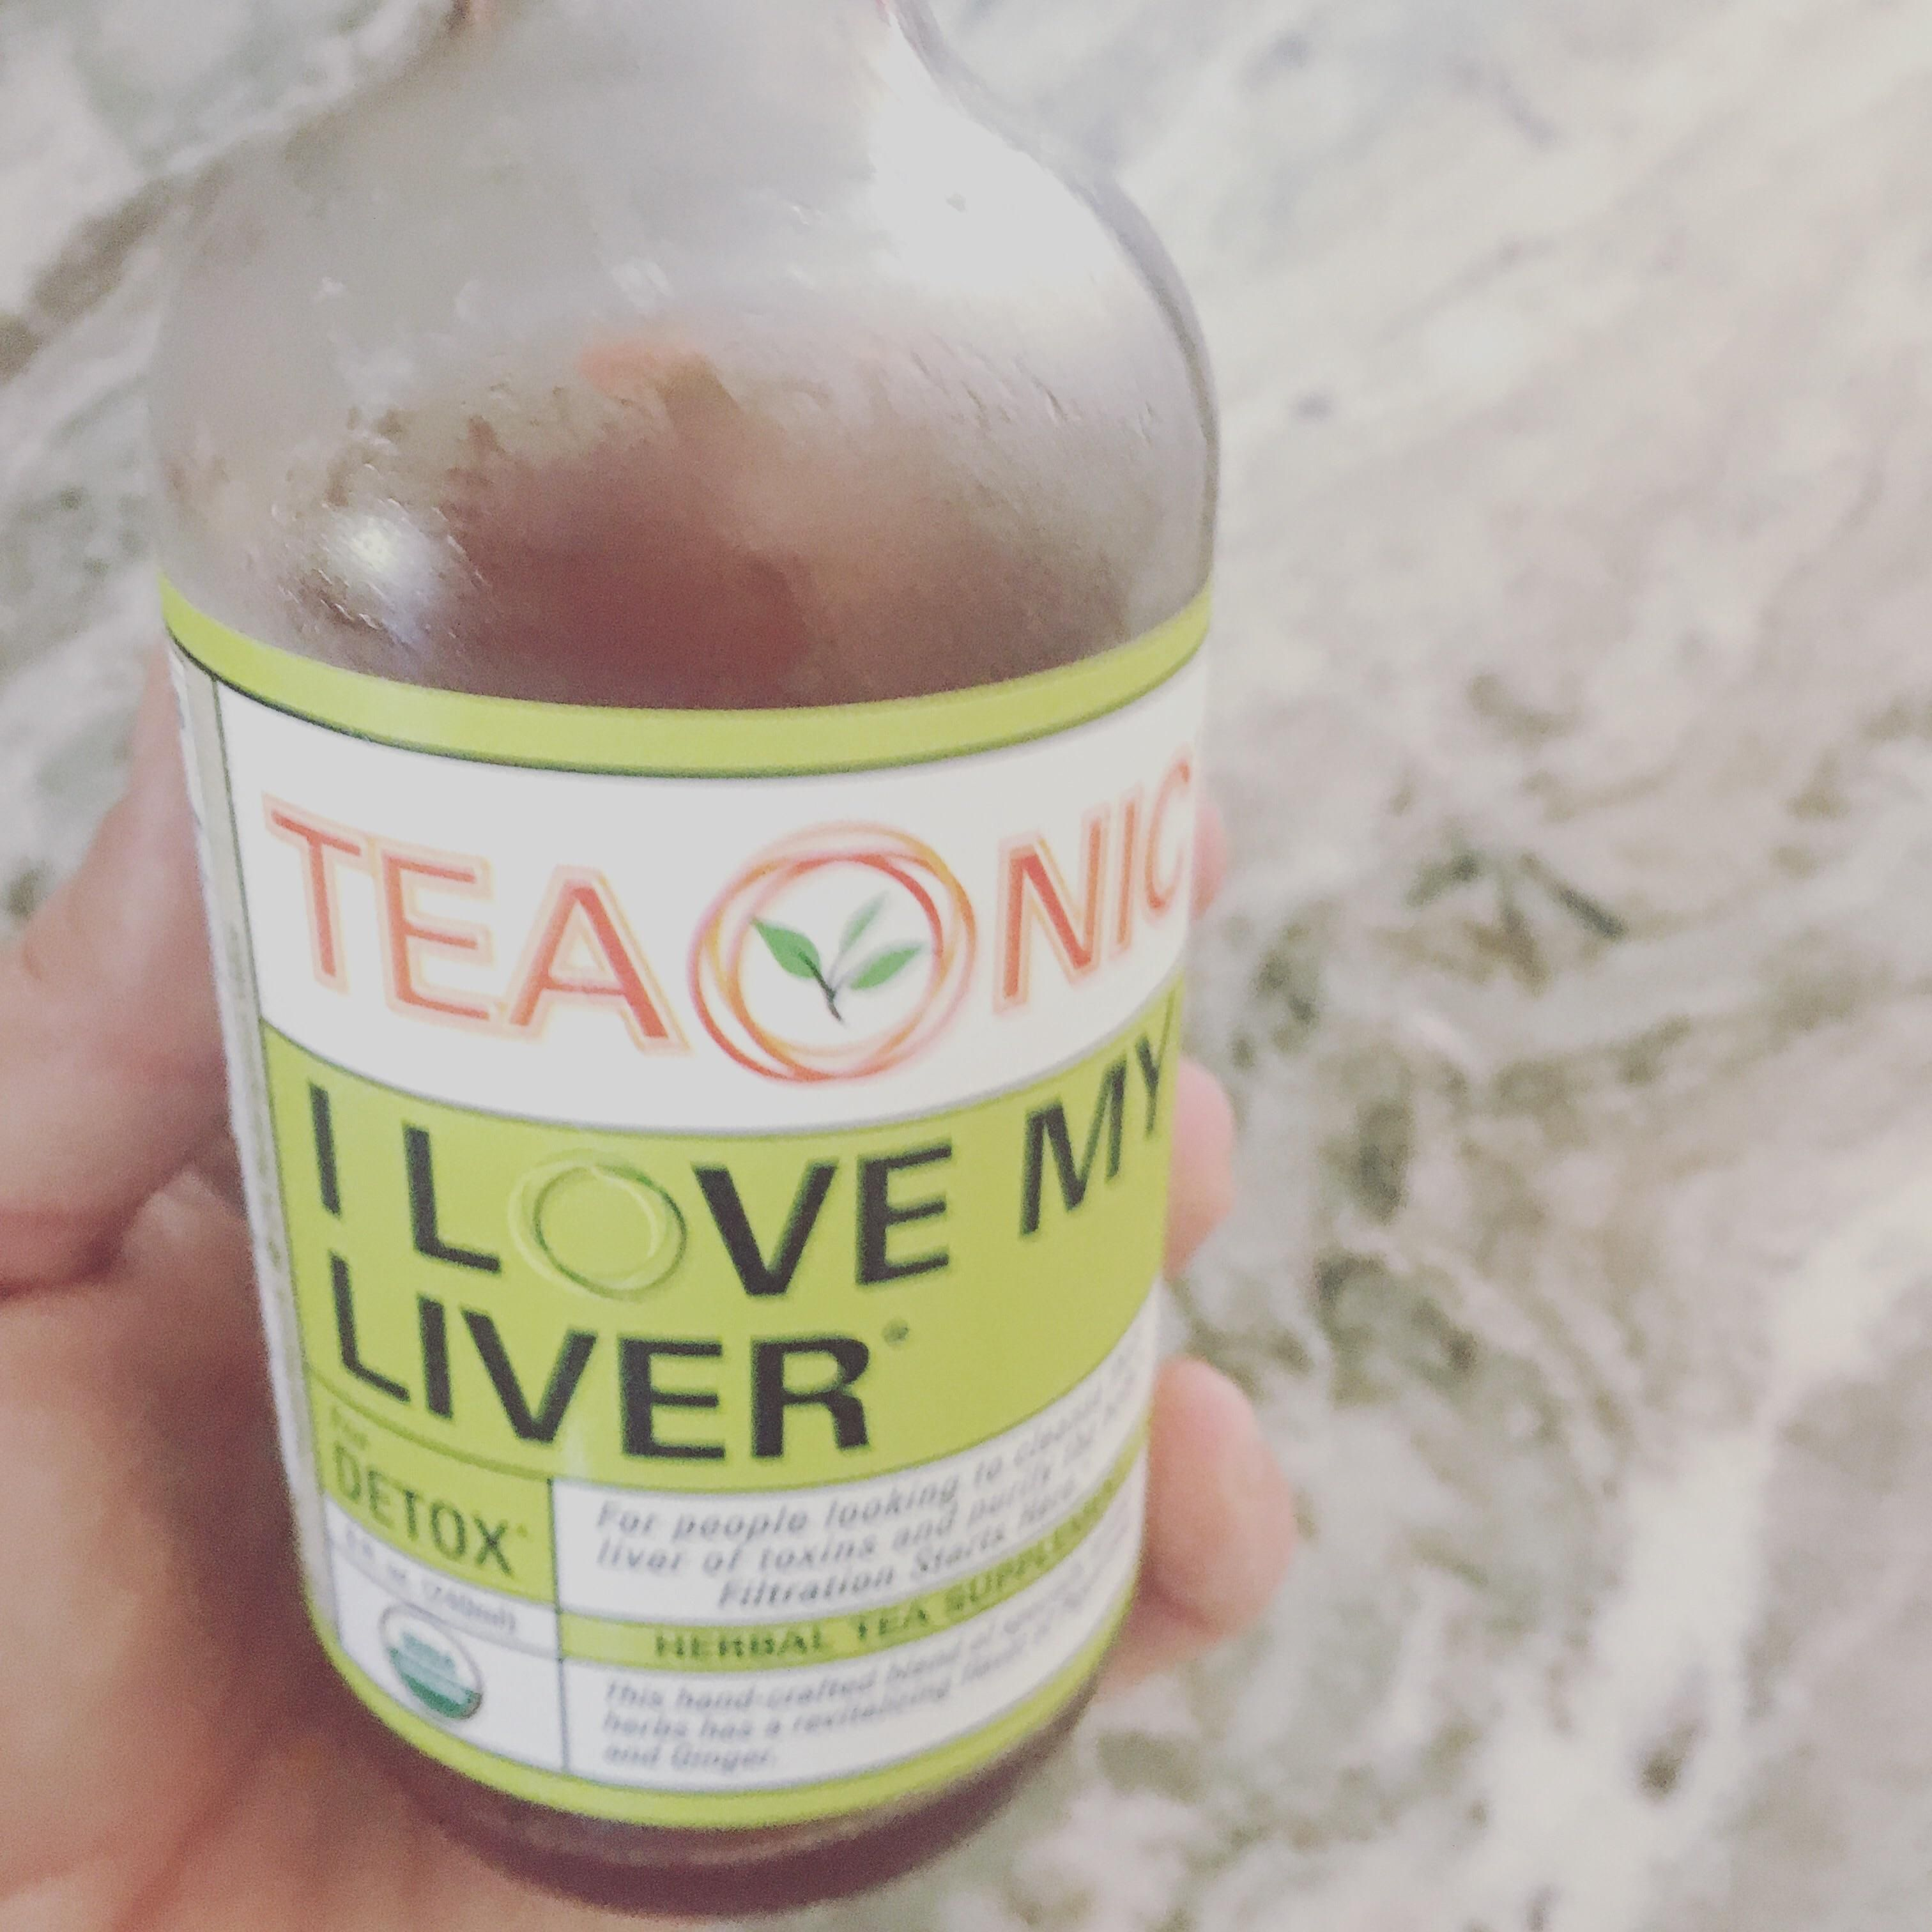 Herbal detox tonic herbal detox detox tonic herbalism